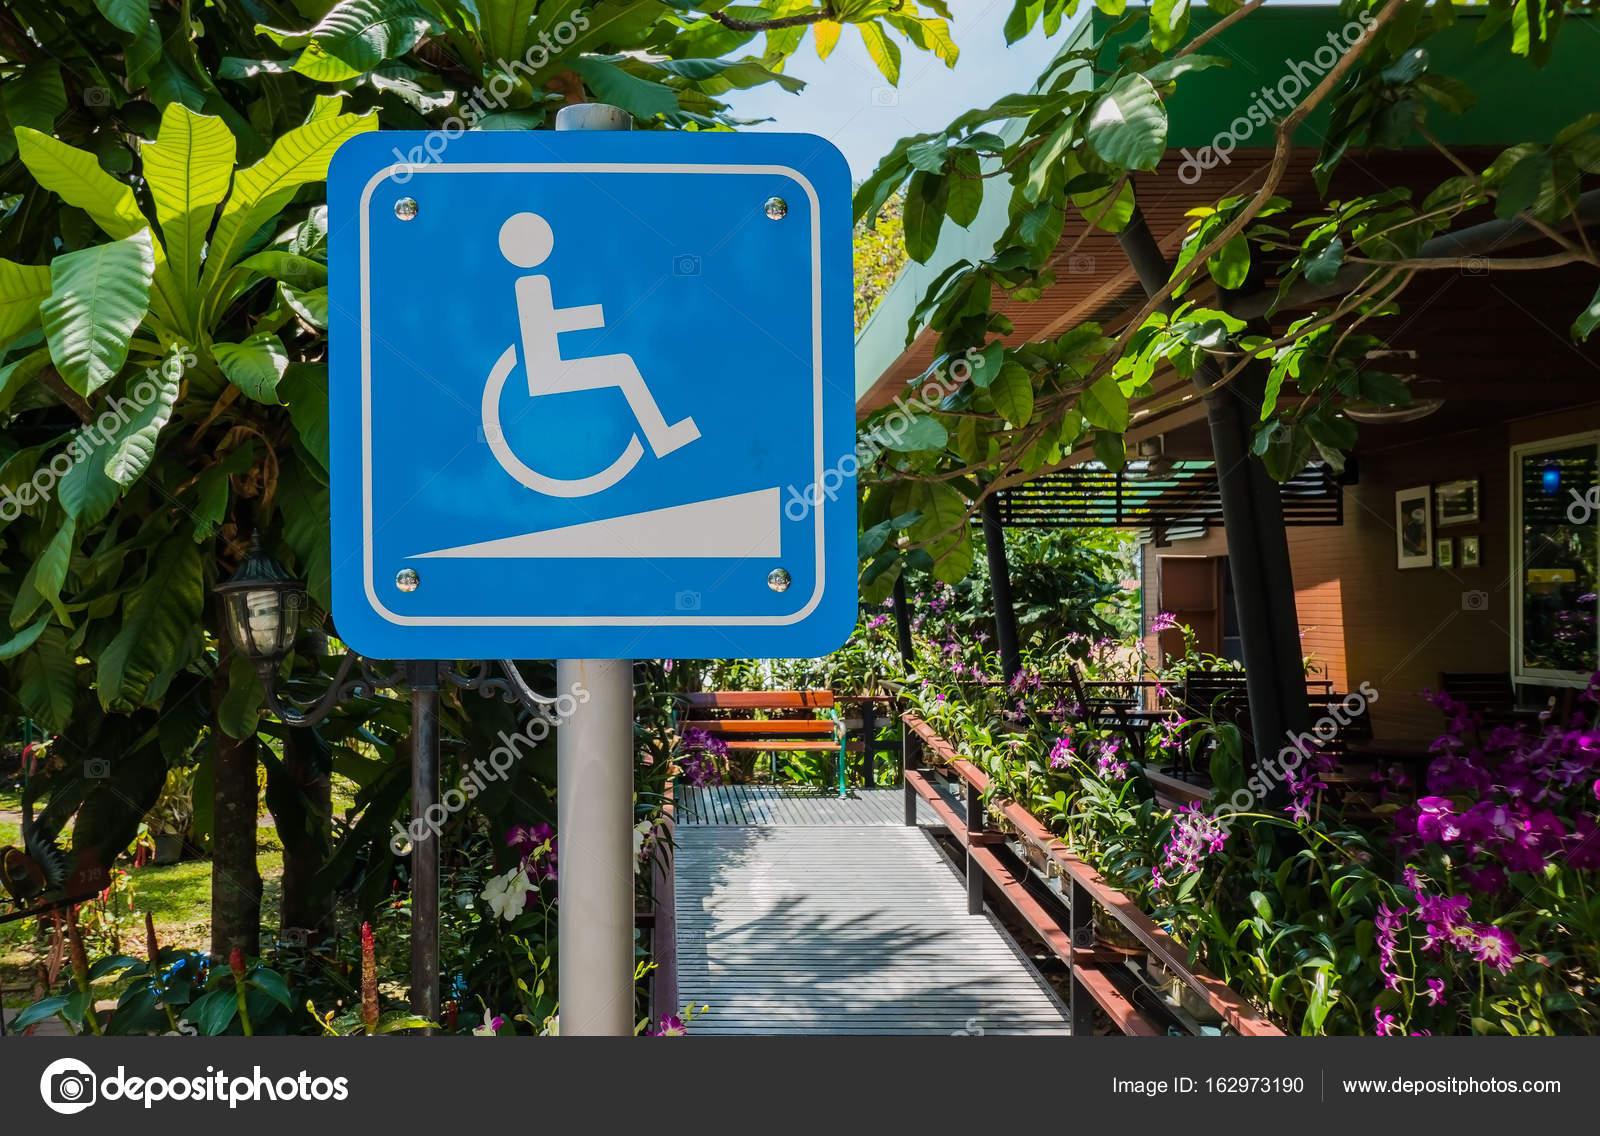 White and blue handicap symbol car parking of disabled special white and blue handicap symbol car parking of disabled special parking places for disable buycottarizona